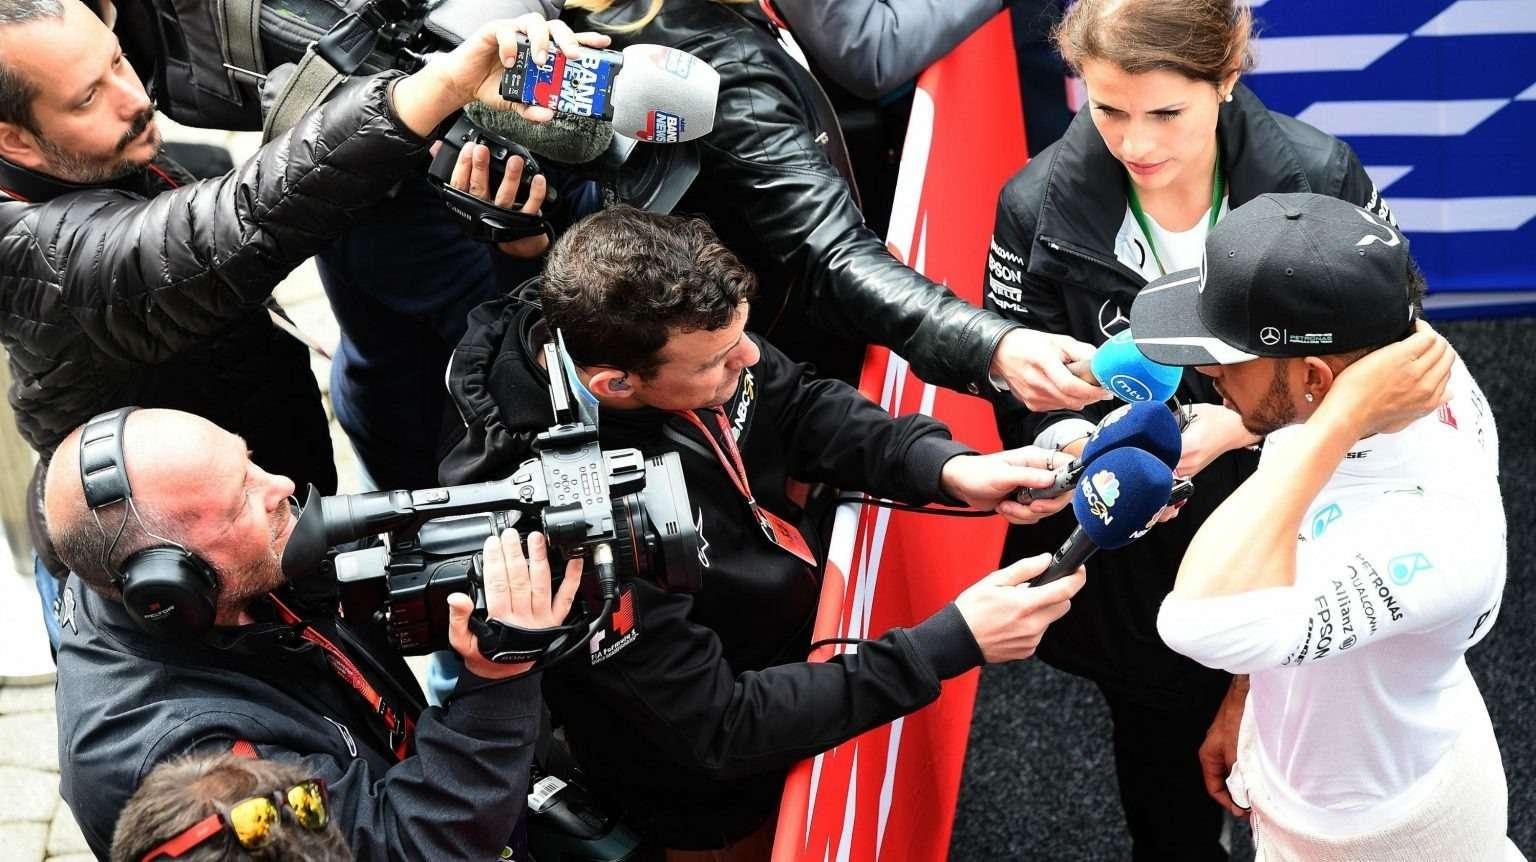 Формула 1, Сочи, Сочи Автодром, Гран При России, Mercedes, Льюис Хэмилтон